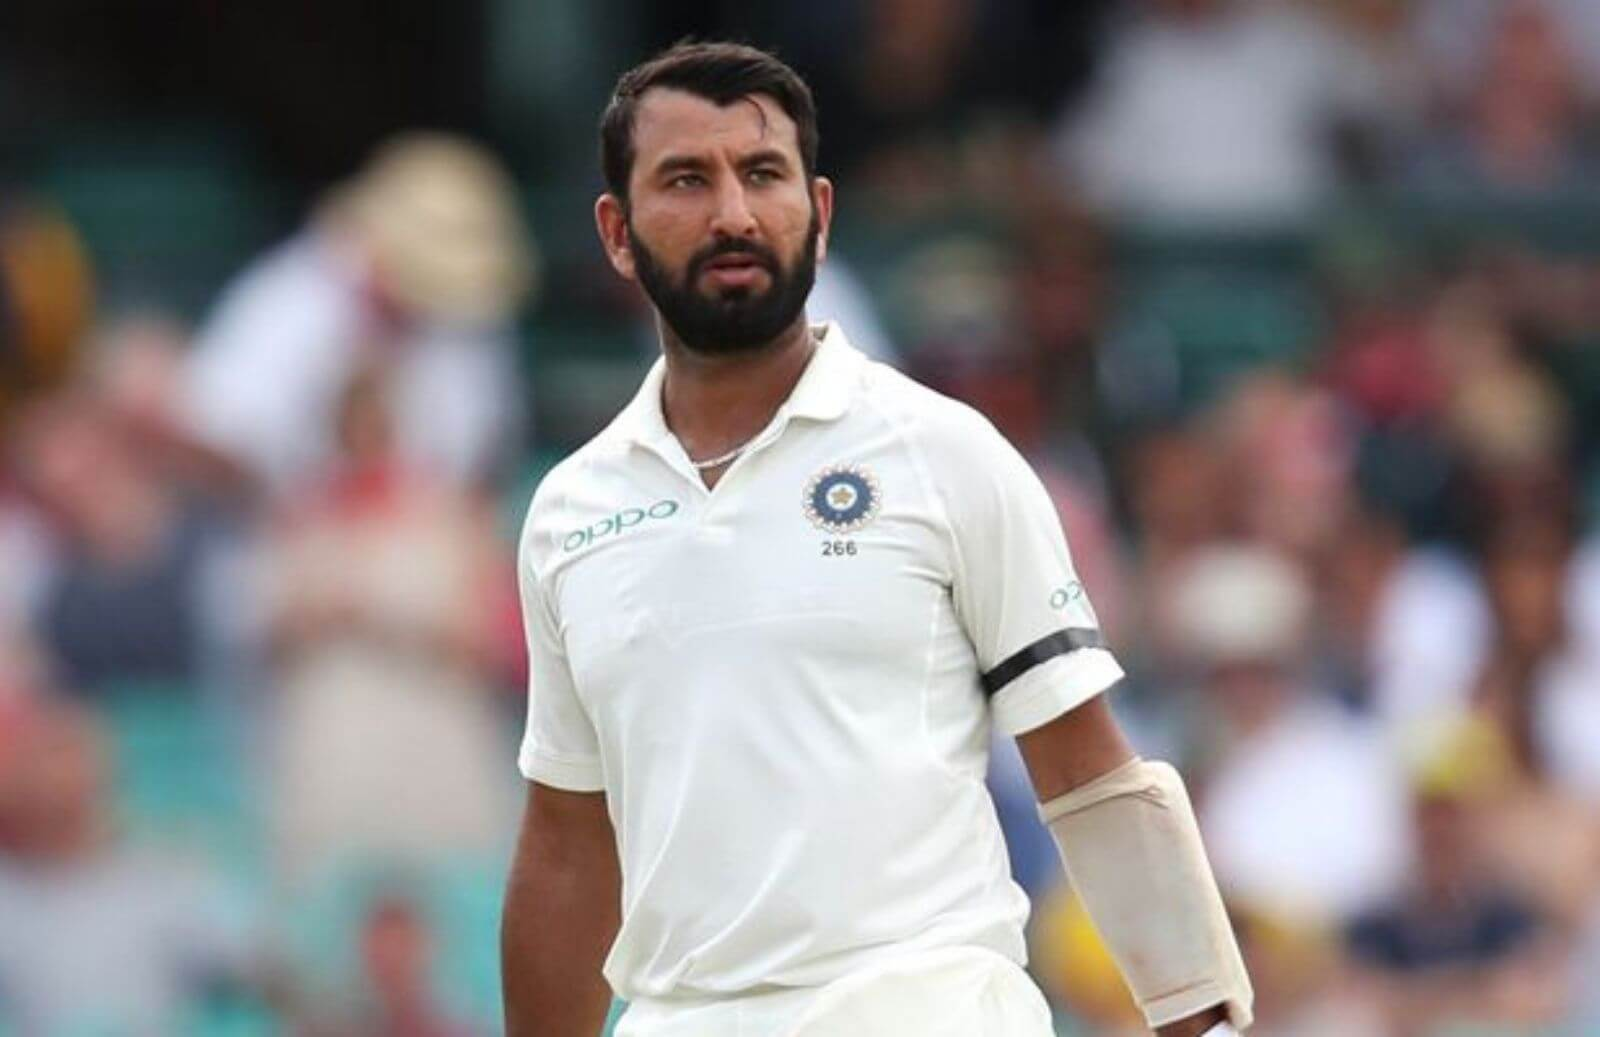 Watch_ Stubborn Cheteshwar Pujara Departs, Nathan Lyon Bowls Peach Of A Delivery To Dismiss Indian Batsman